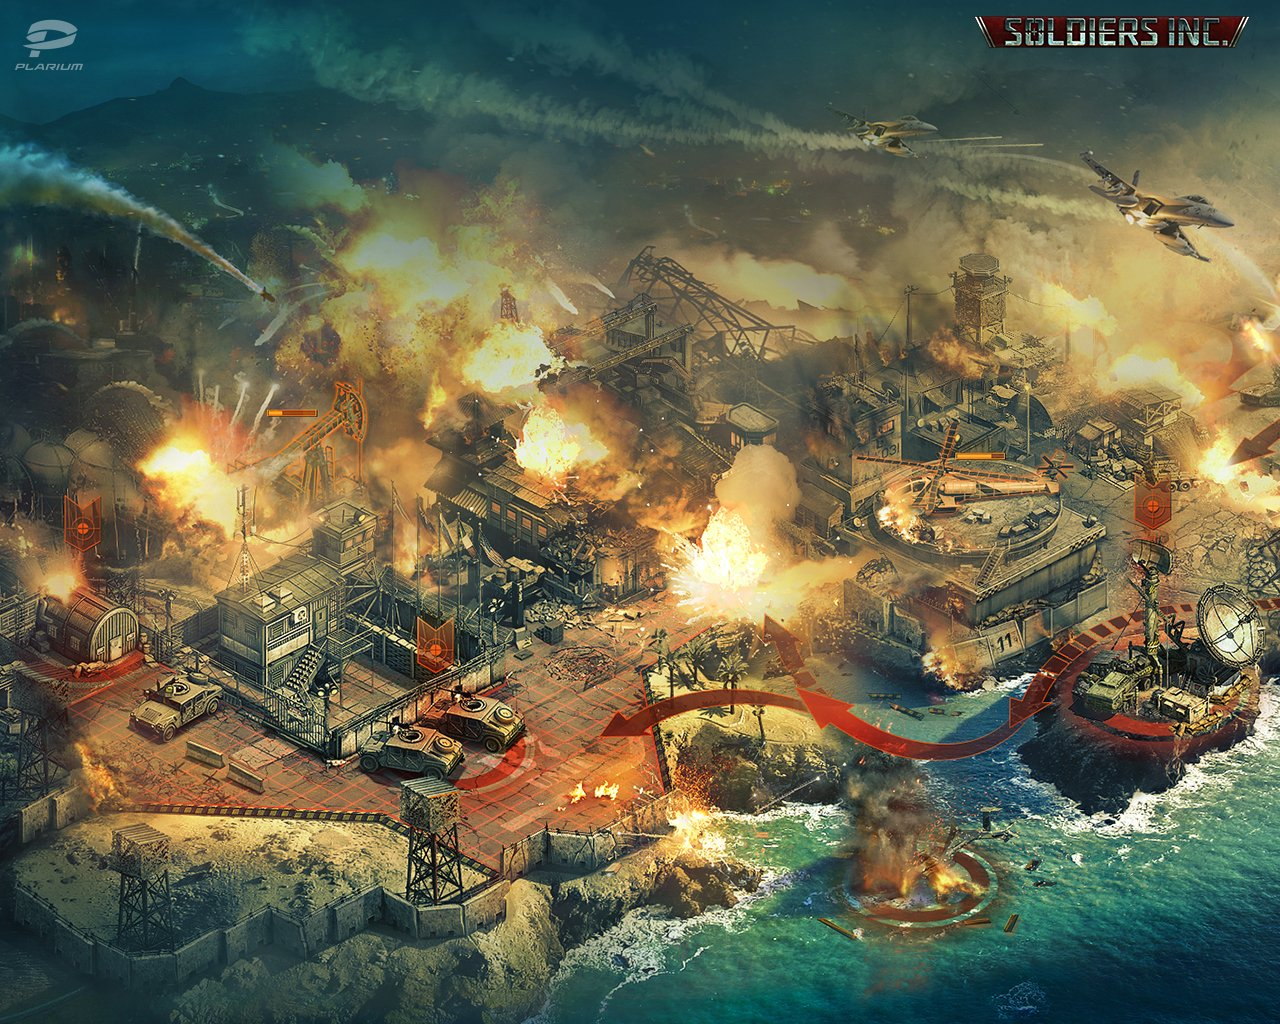 3d Money Wallpaper Soldiers Inc Images Pivotal Gamers